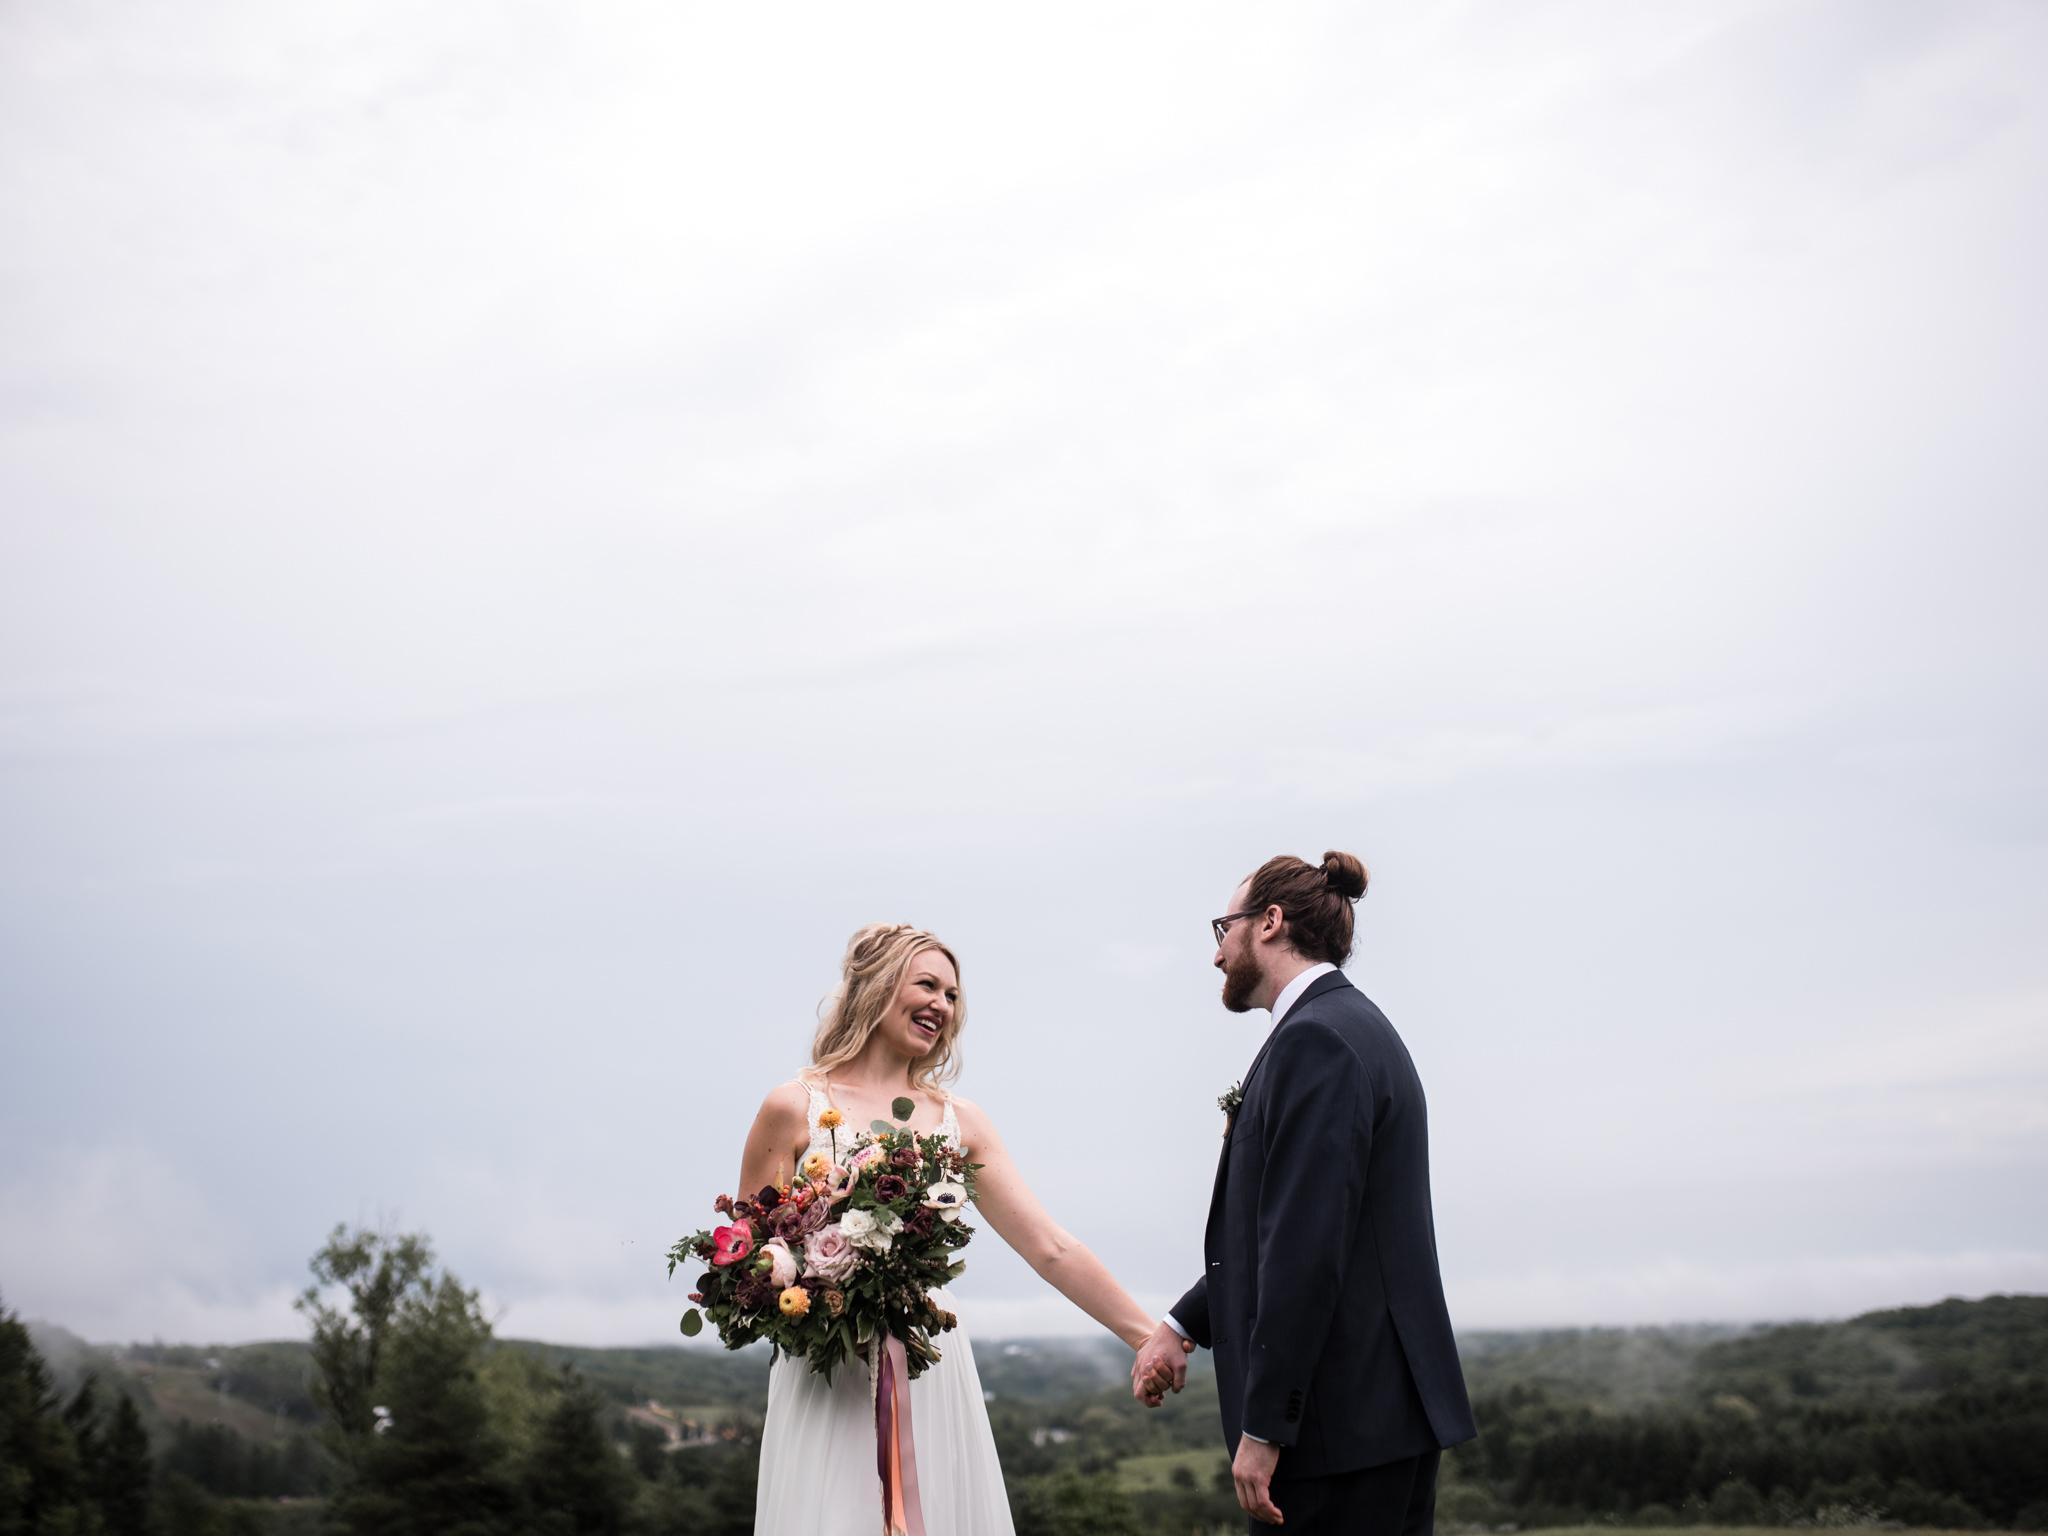 skyloft-wedding-toronto-wedding-photographer-25.jpg